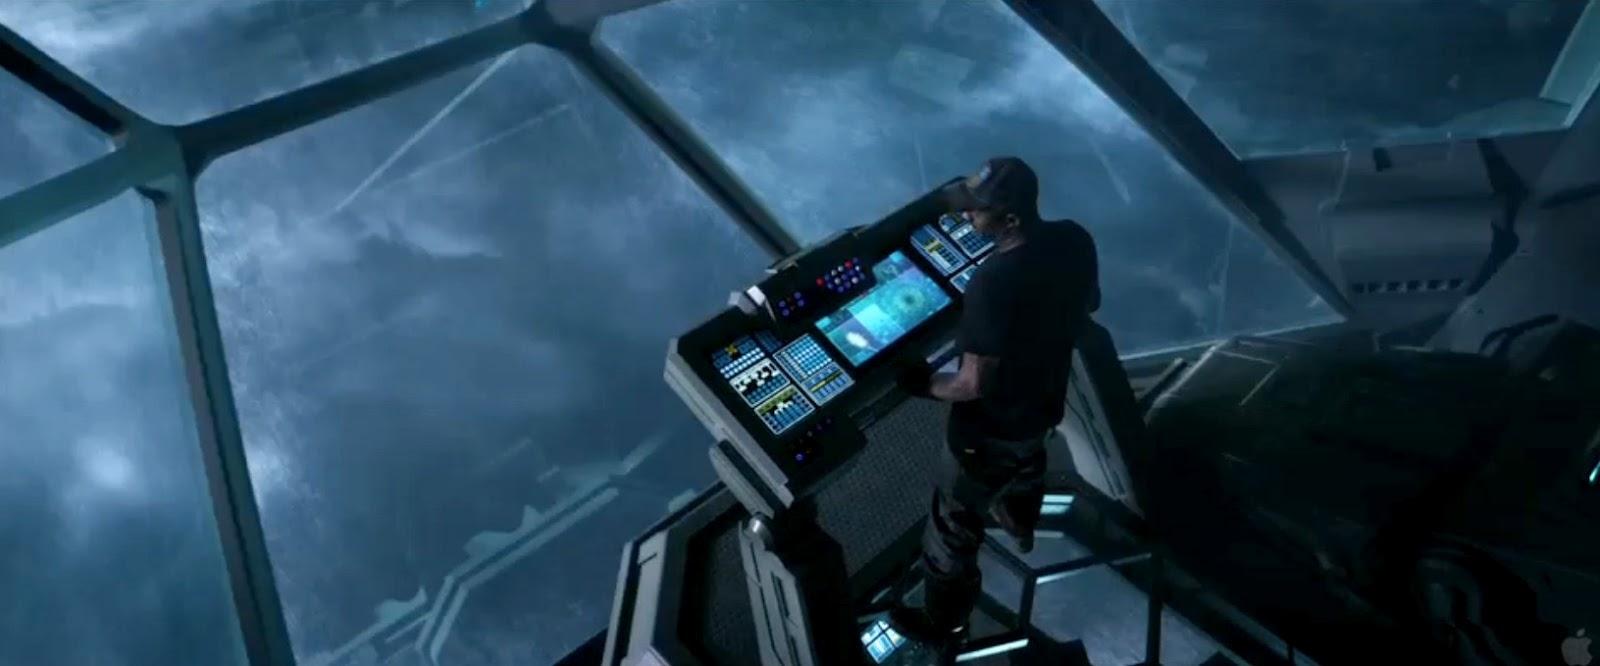 sci fi spacecraft cockpit single person - photo #5